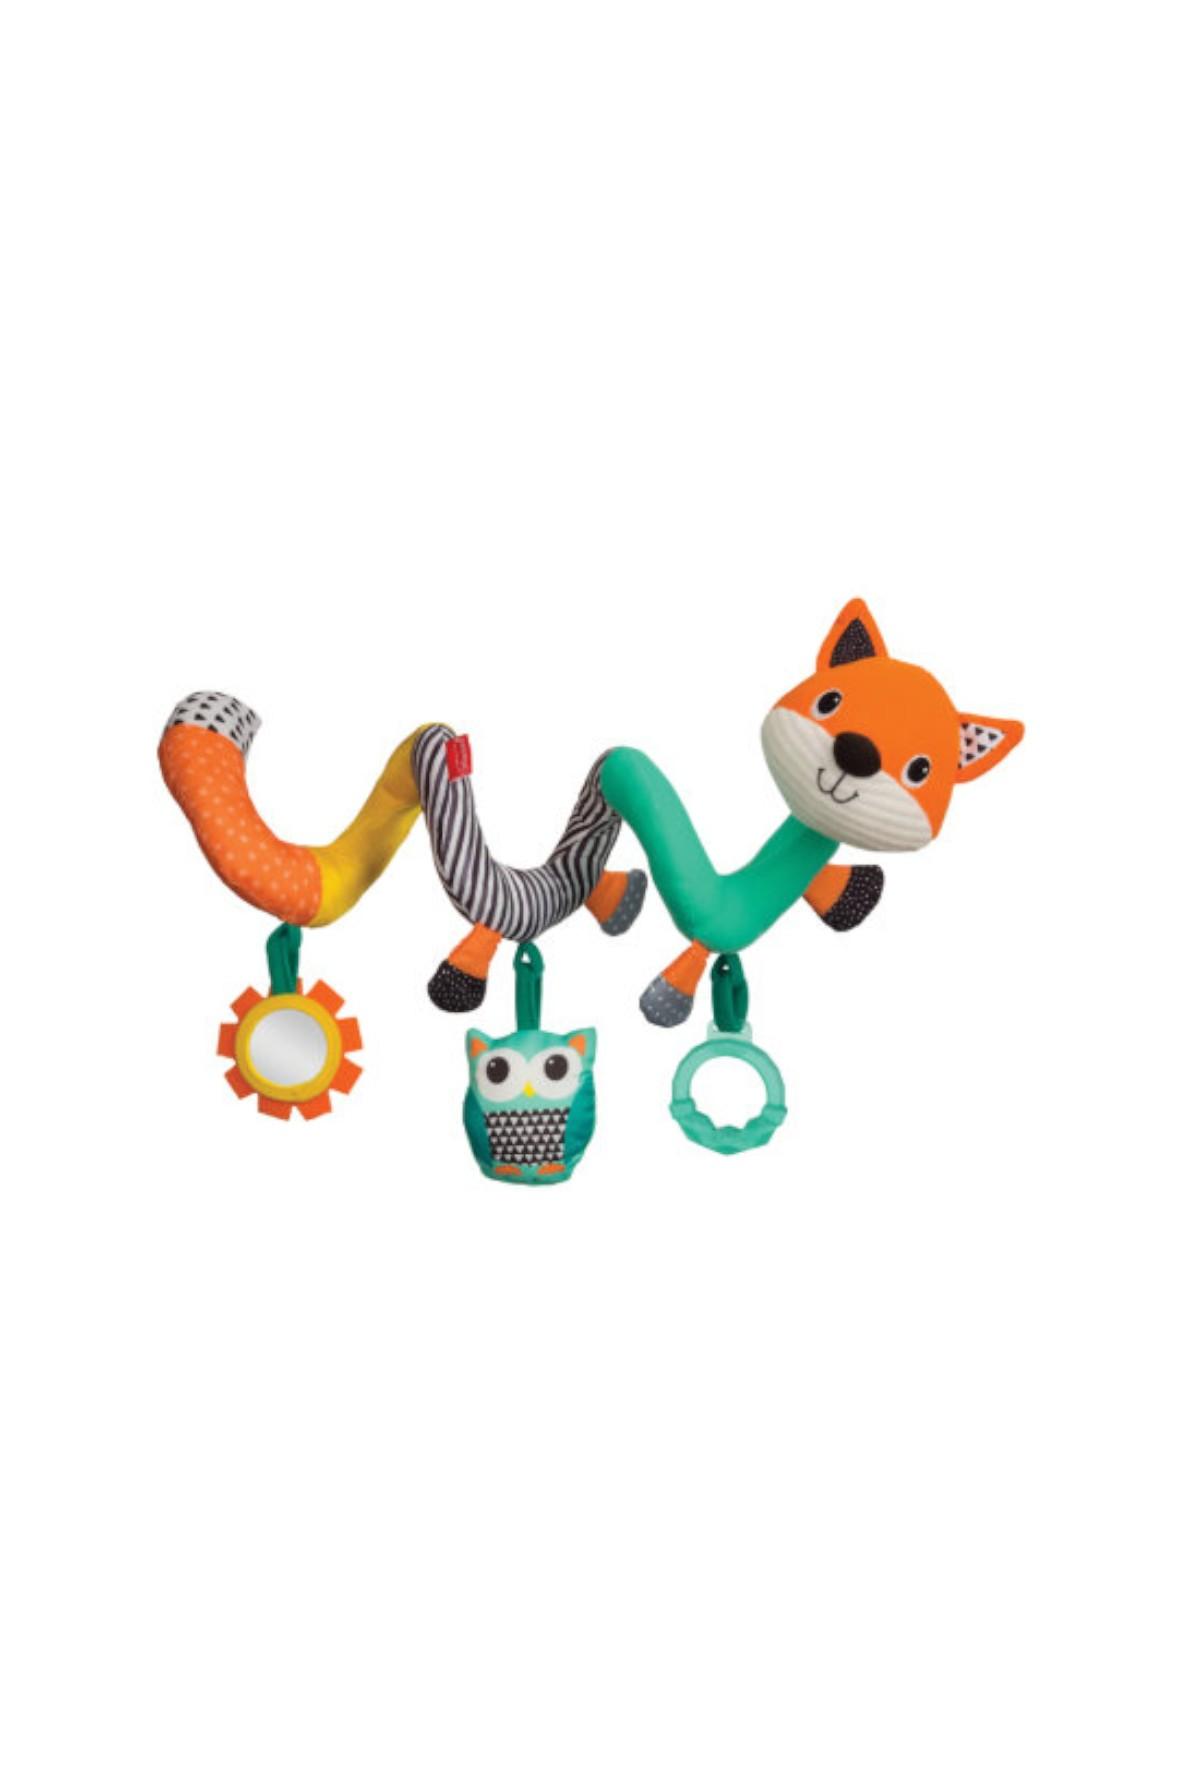 Spiralna zabawka edukacyjna Lis Infantino 0msc+